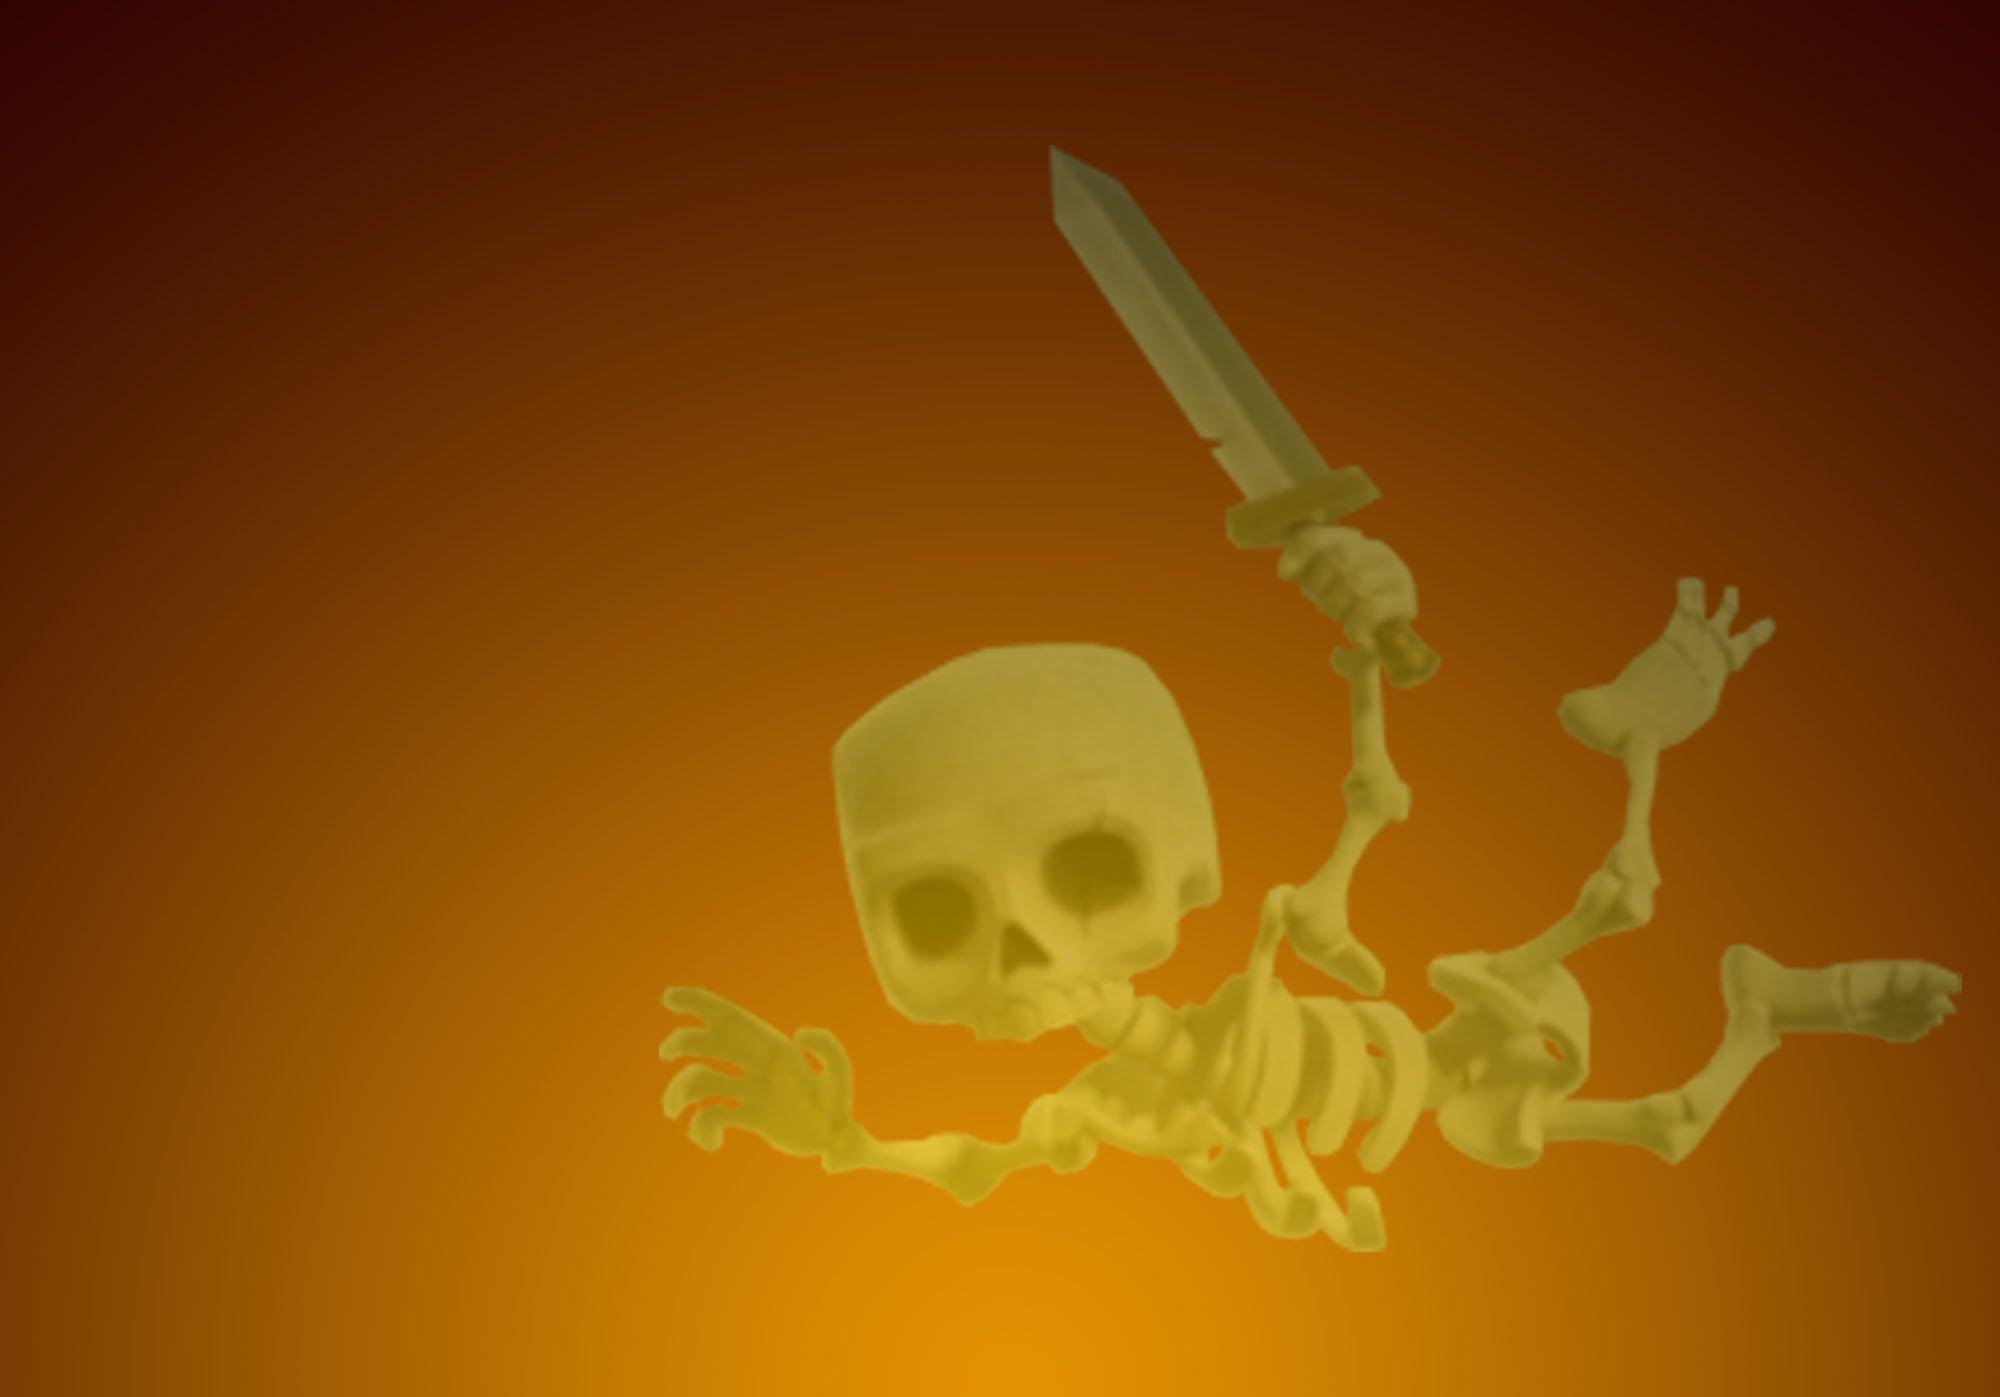 Clash of Clans Drop Ship/Skeleton